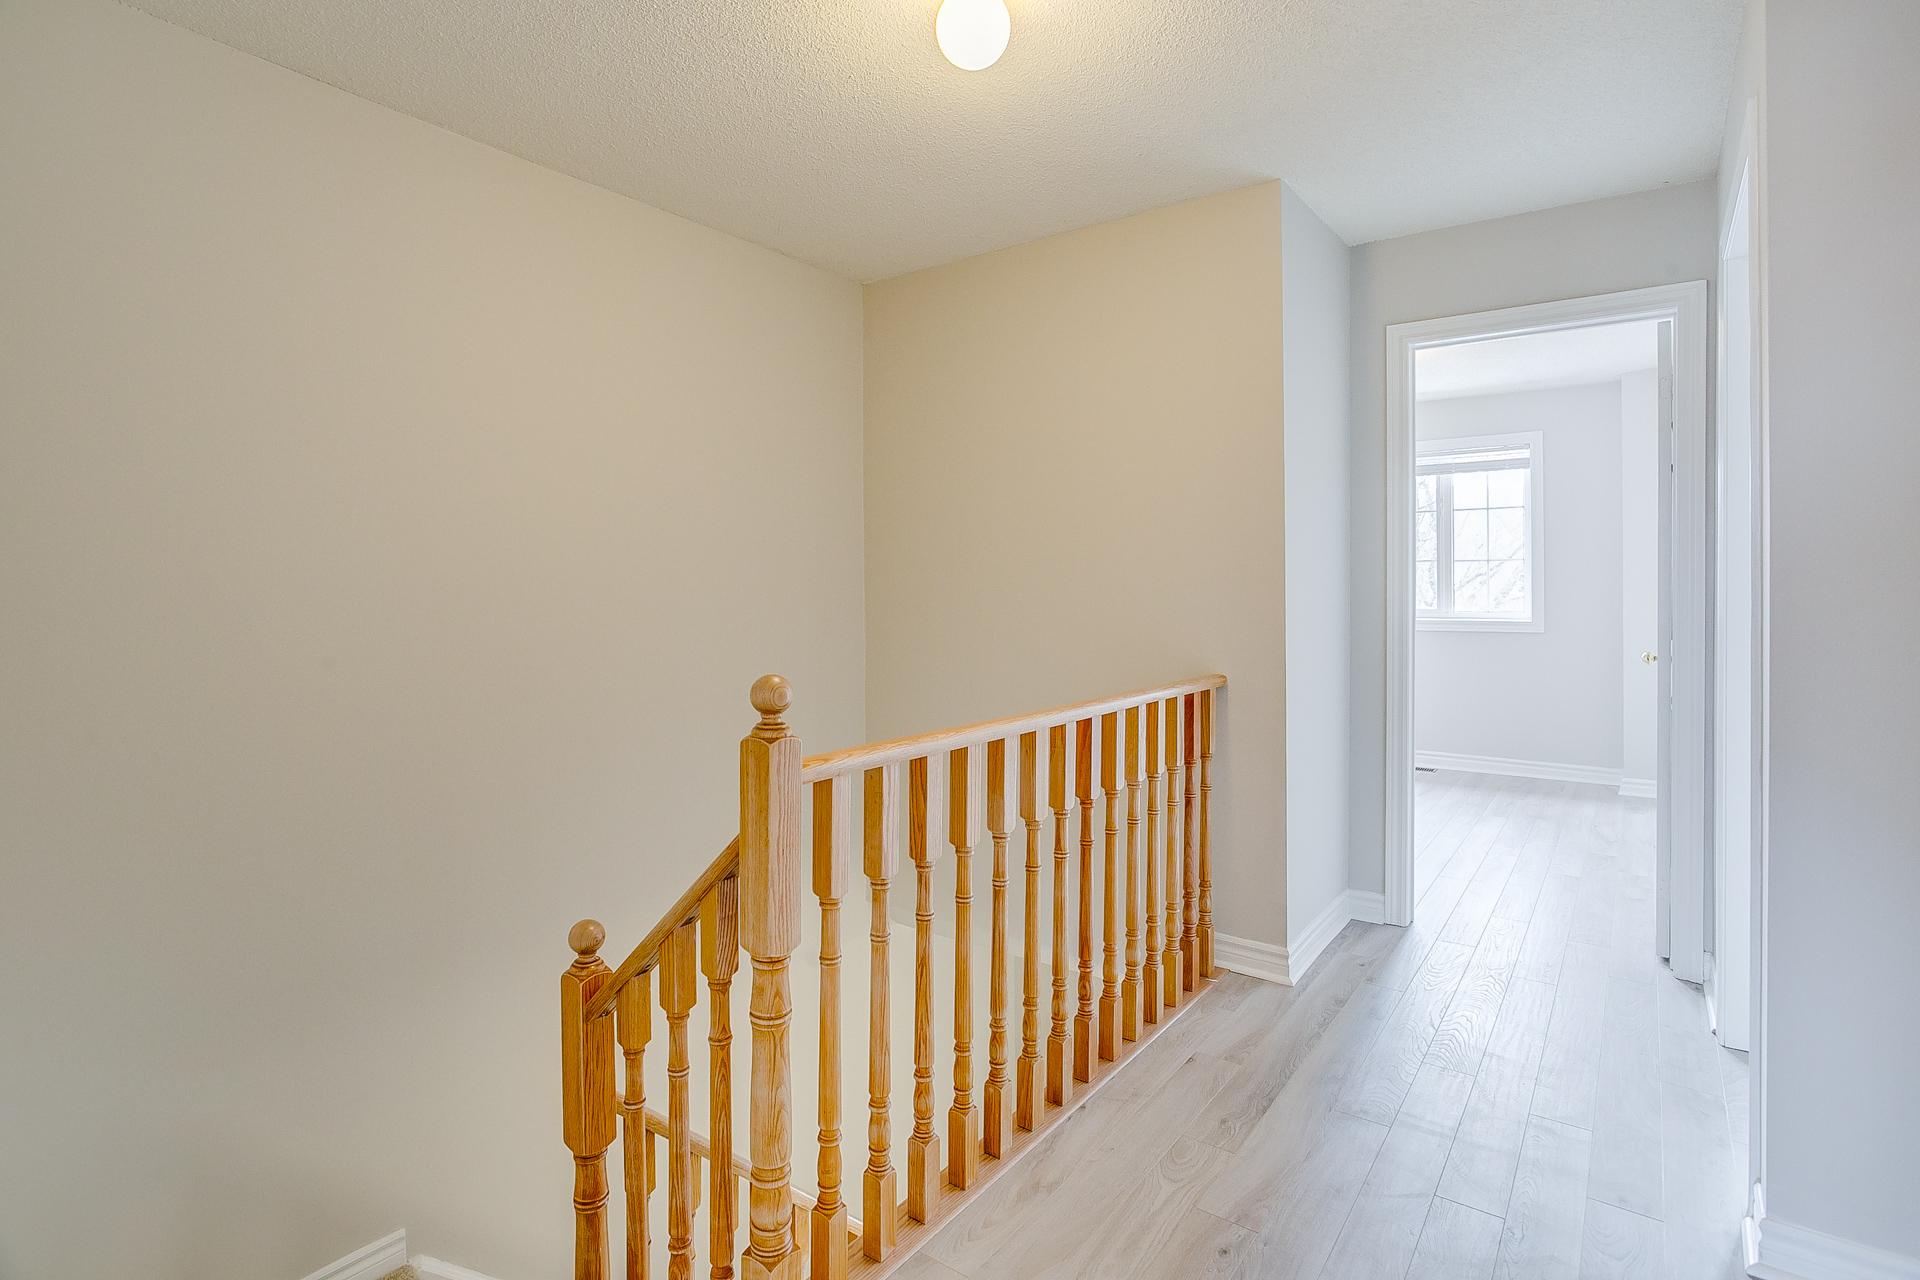 25_upper_hallway_1.jpg